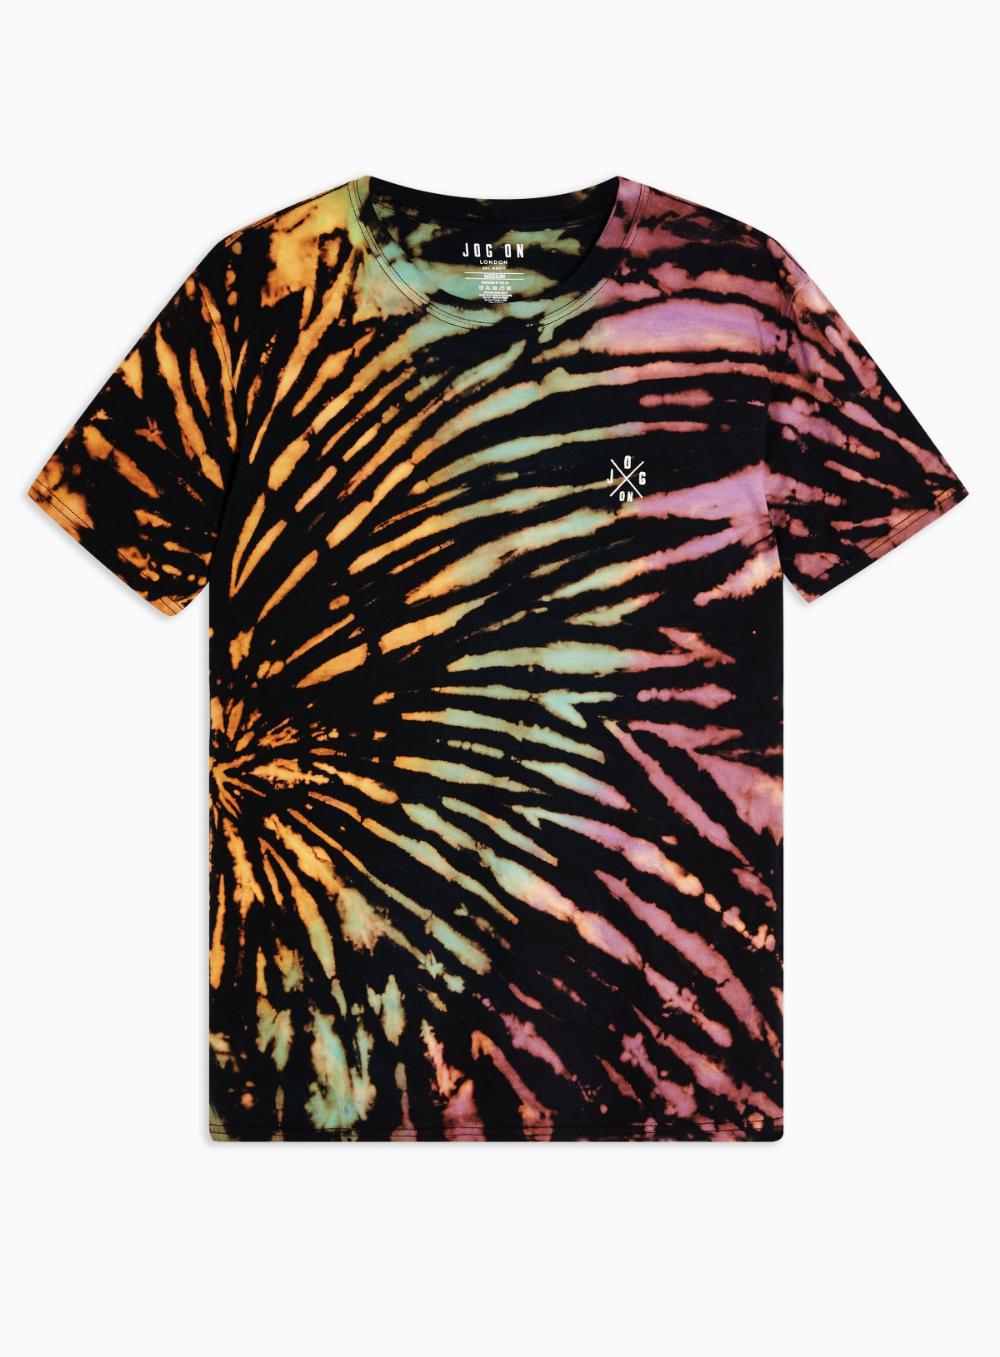 Jog On Black Hand Bleached T Shirt Topman Bleach T Shirts Black Tie Dye Shirt Create T Shirt Design [ 1357 x 1000 Pixel ]